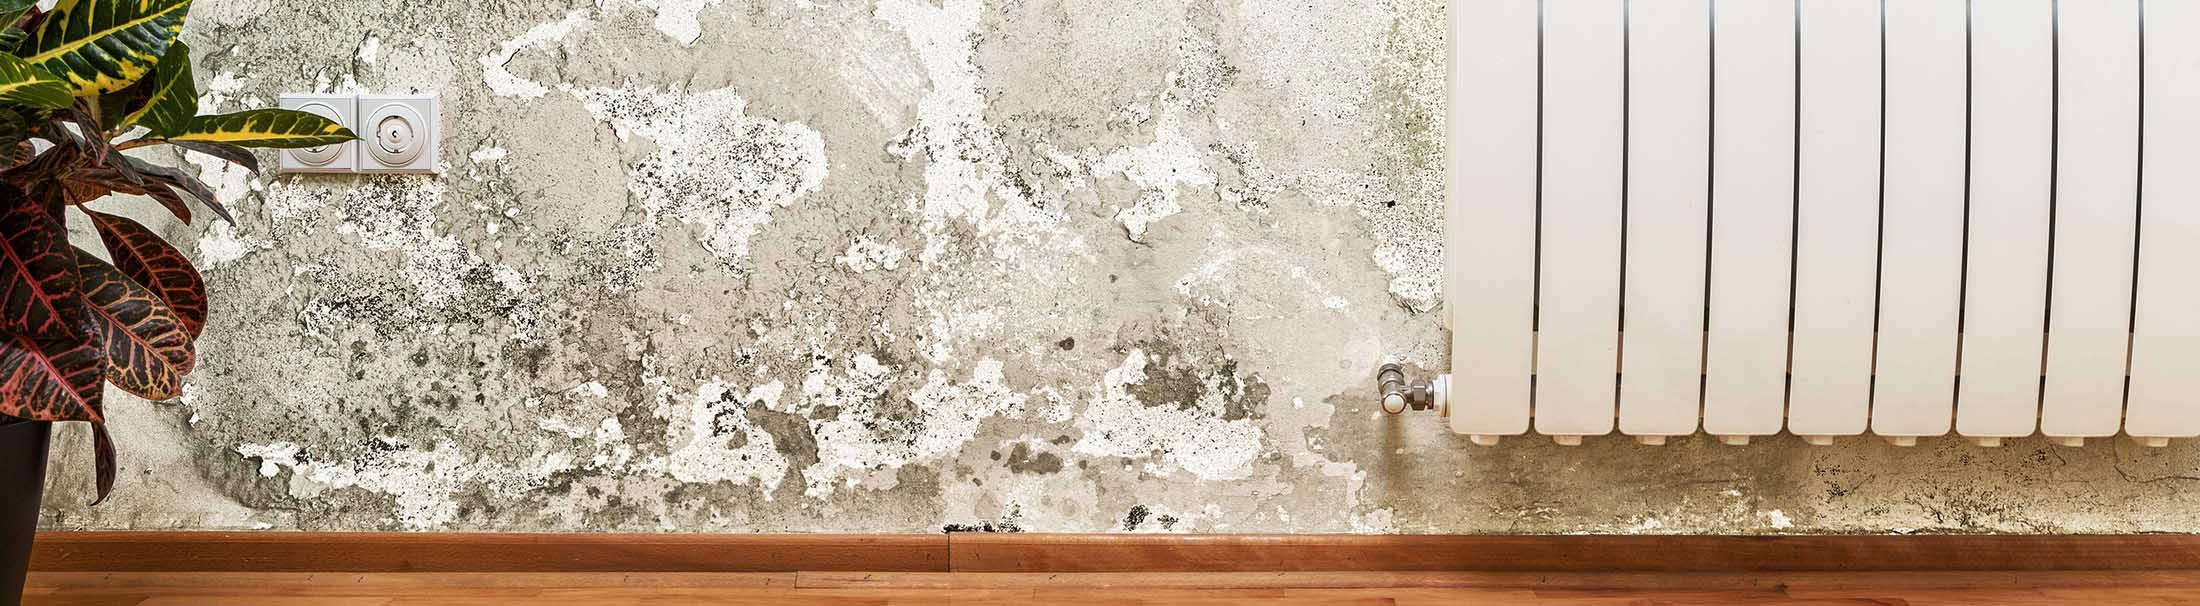 Home Inspection Moisture Damage